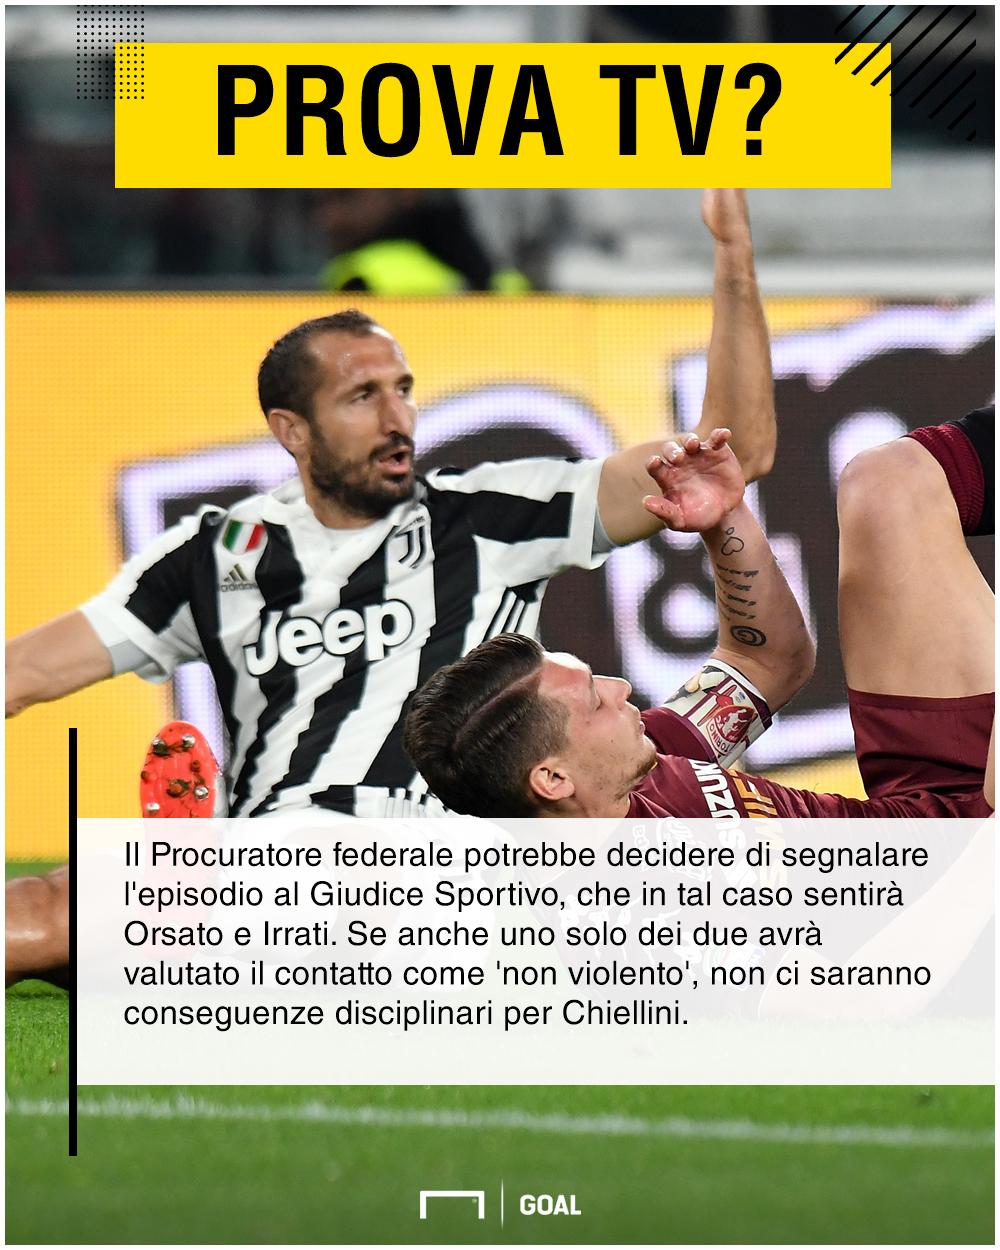 Juventus, Chiellini rischia la prova tv?